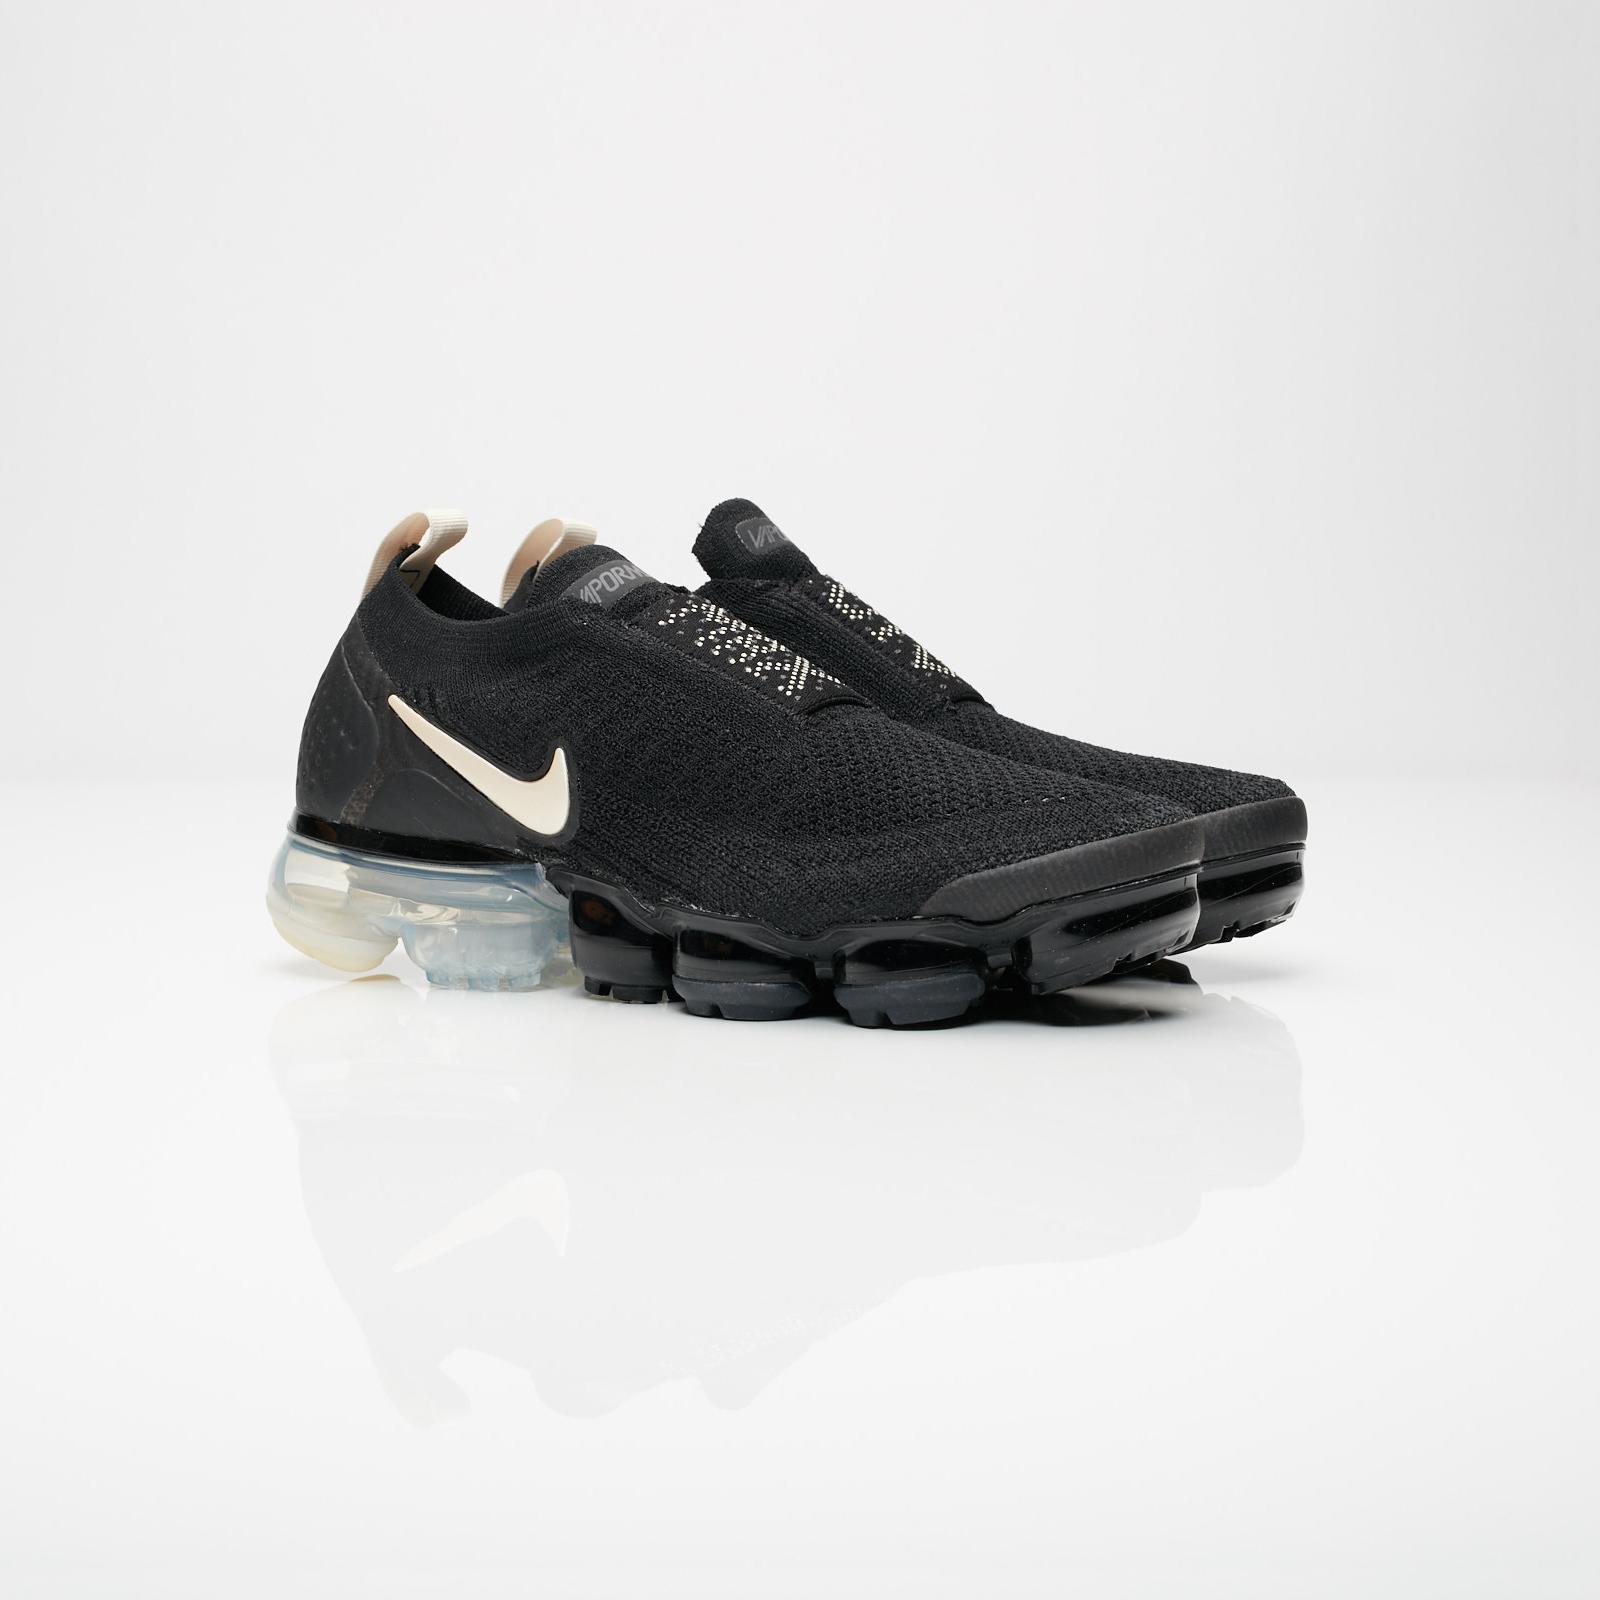 dcd0411172e3 Nike Wmns Air Vapormax Fk Moc 2 - Aj6599-002 - Sneakersnstuff ...